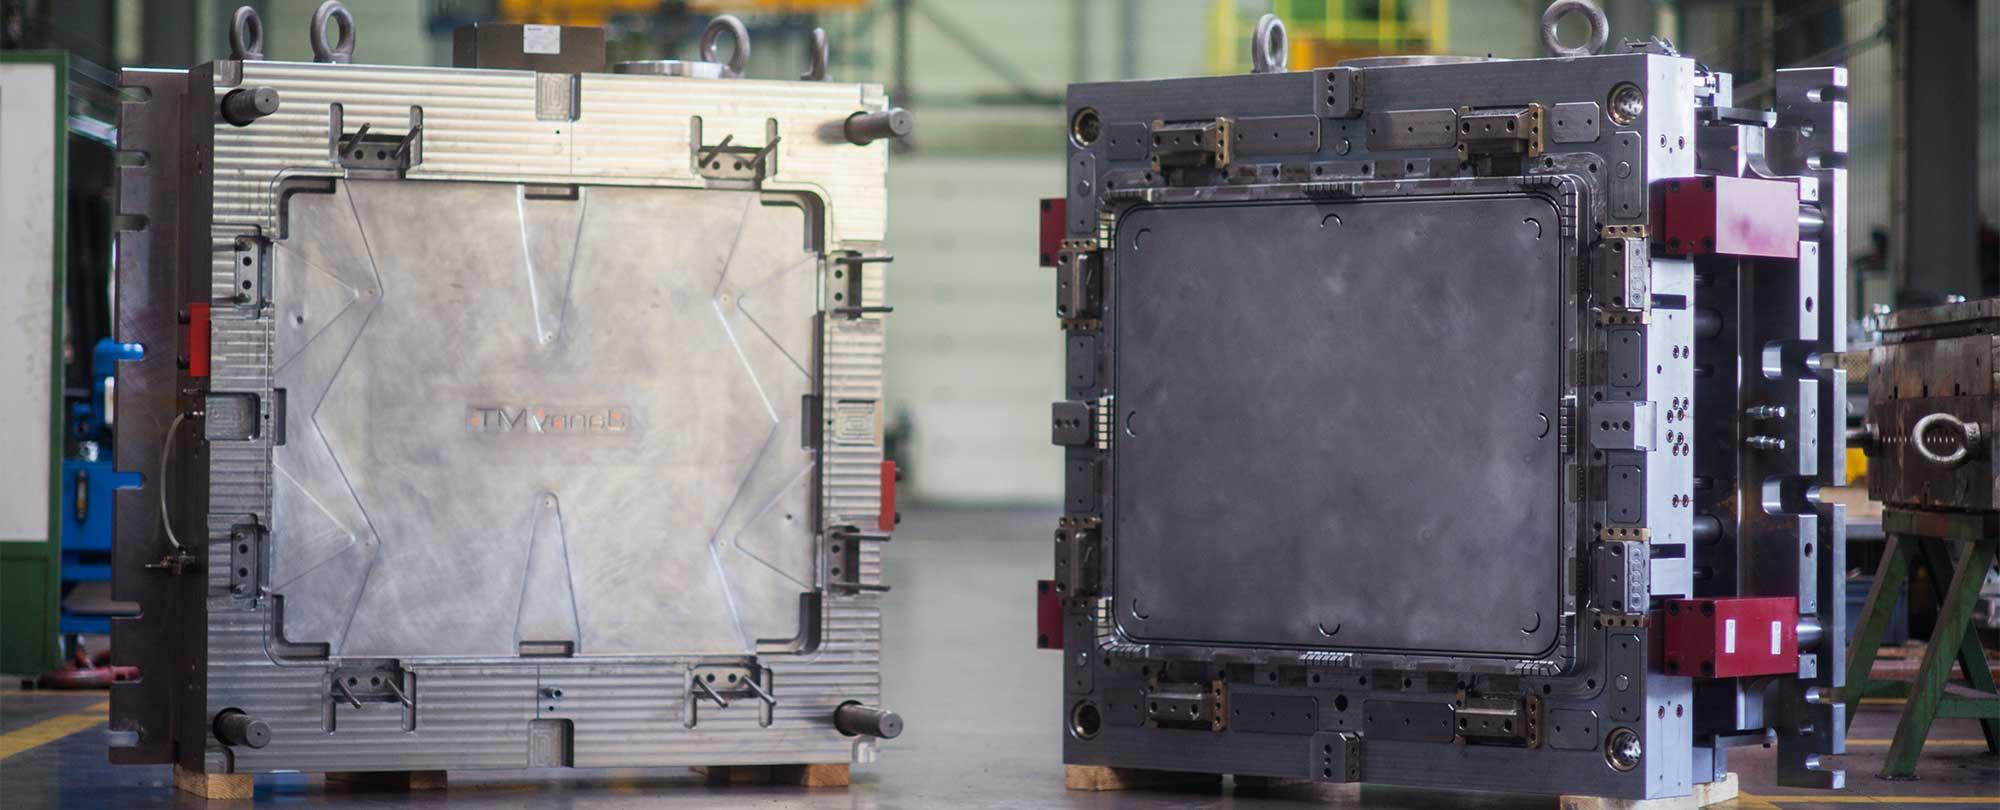 DMM - Injection et compression des thermoplastiques